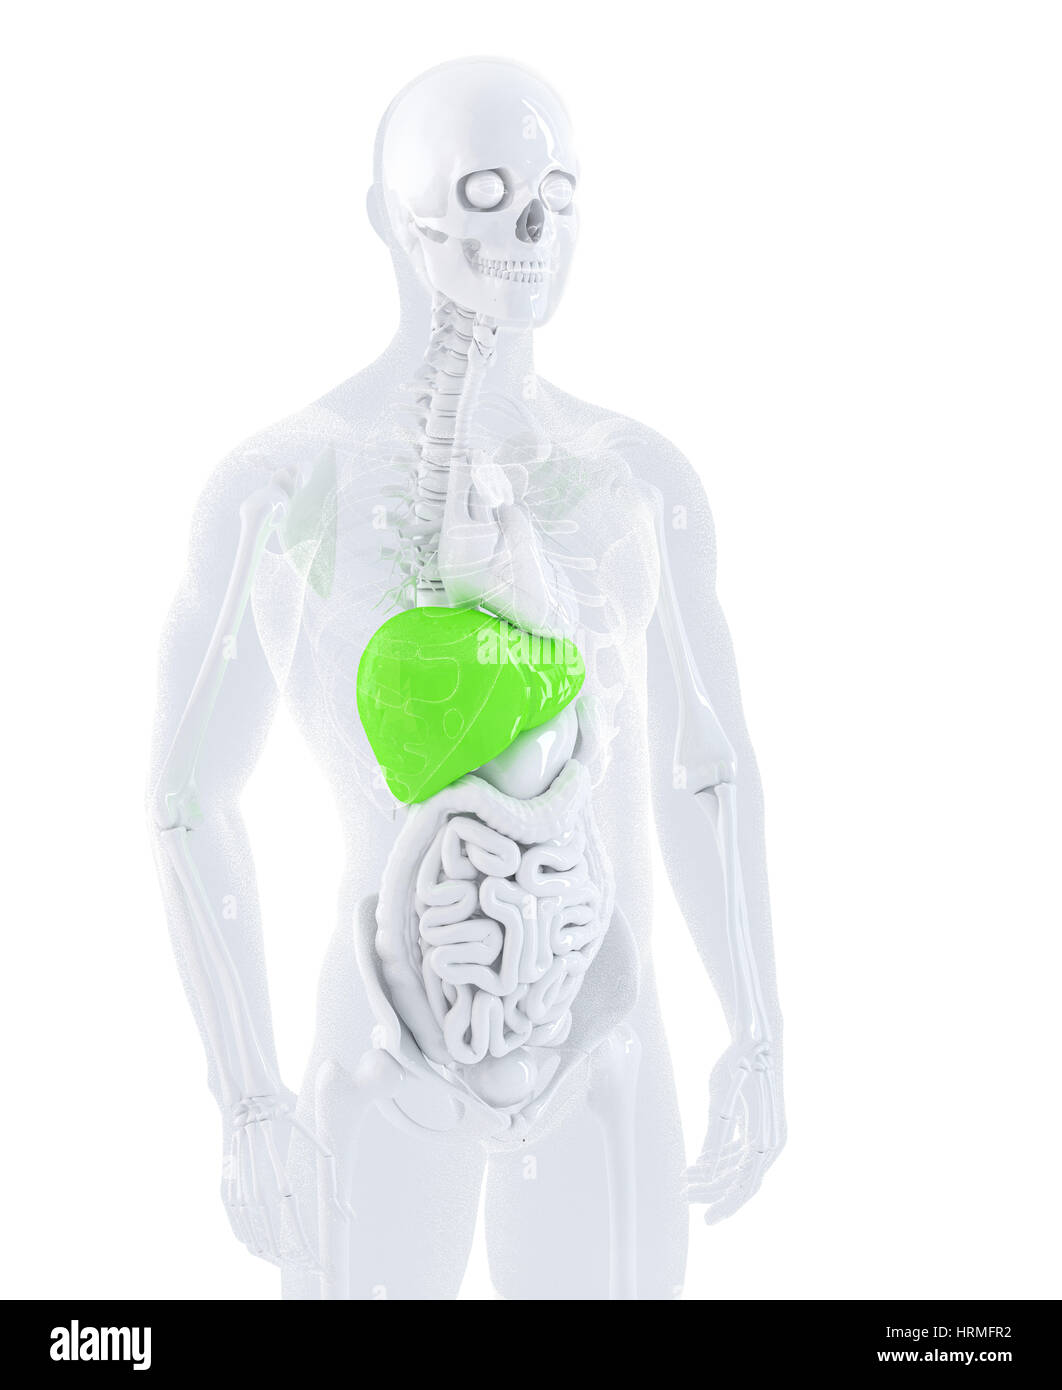 Guts Anatomy Stockfotos & Guts Anatomy Bilder - Alamy